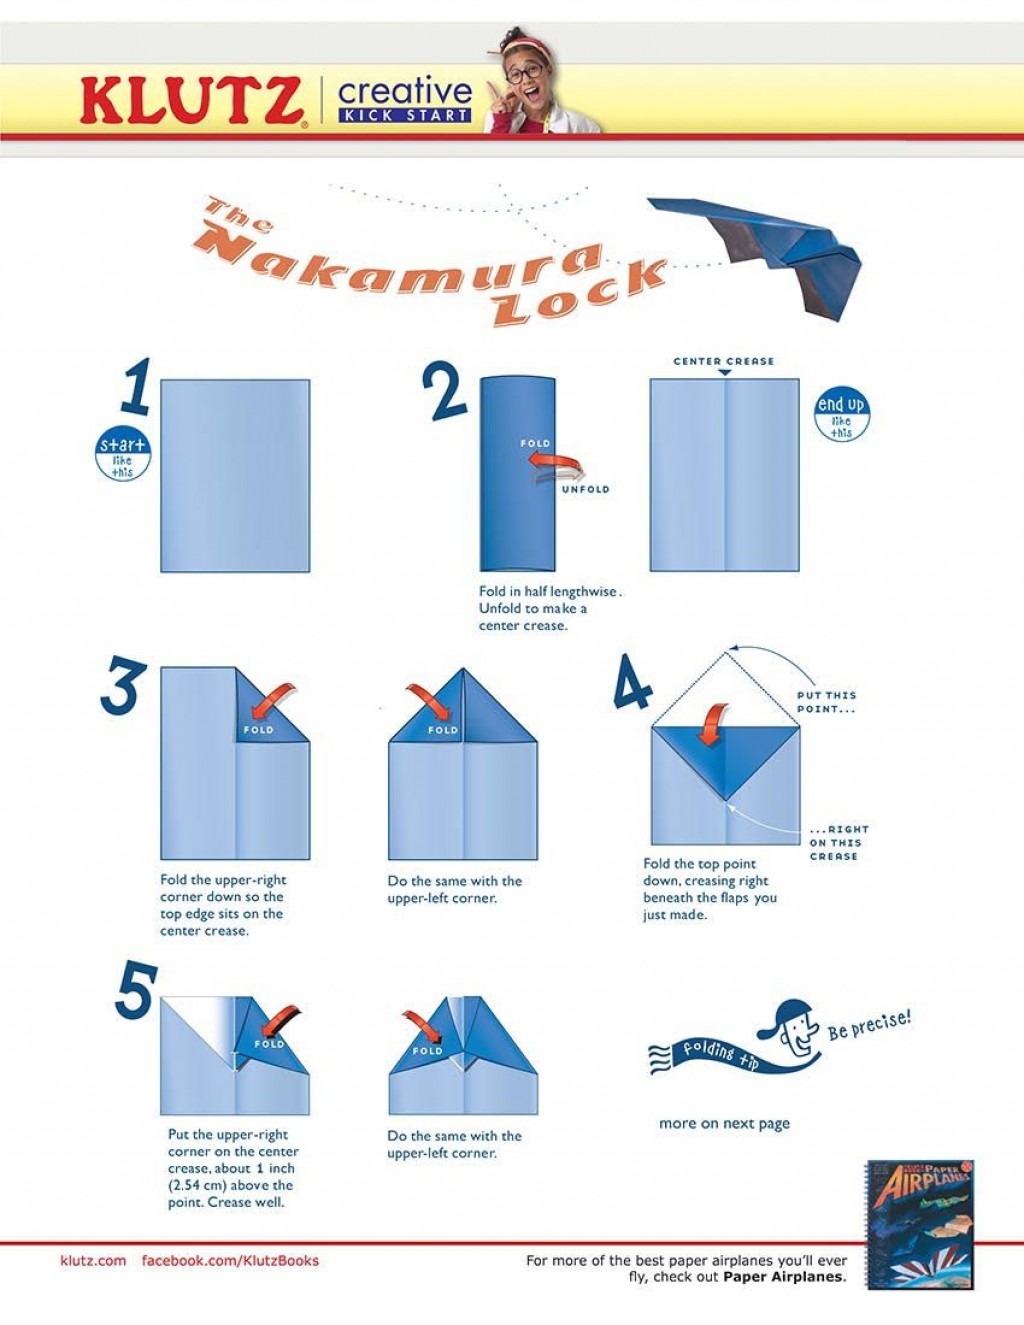 005 Marvelou Printable Paper Airplane Folding Instruction Highest Quality Large